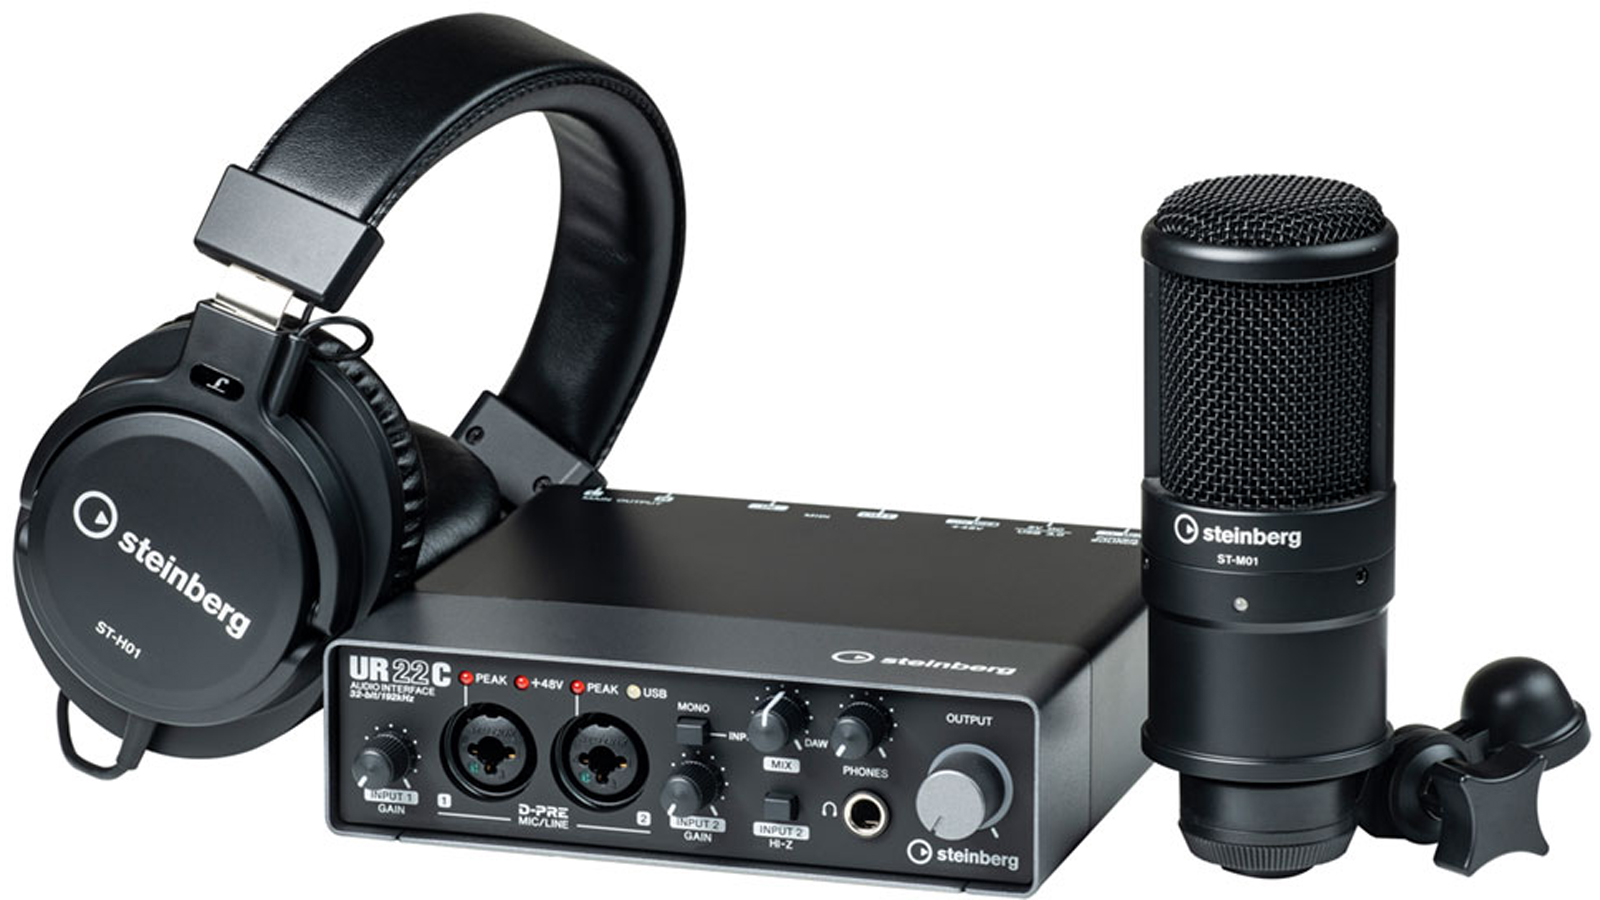 Steinberg UR22C Recording Pack inkl. iPad Anschluss